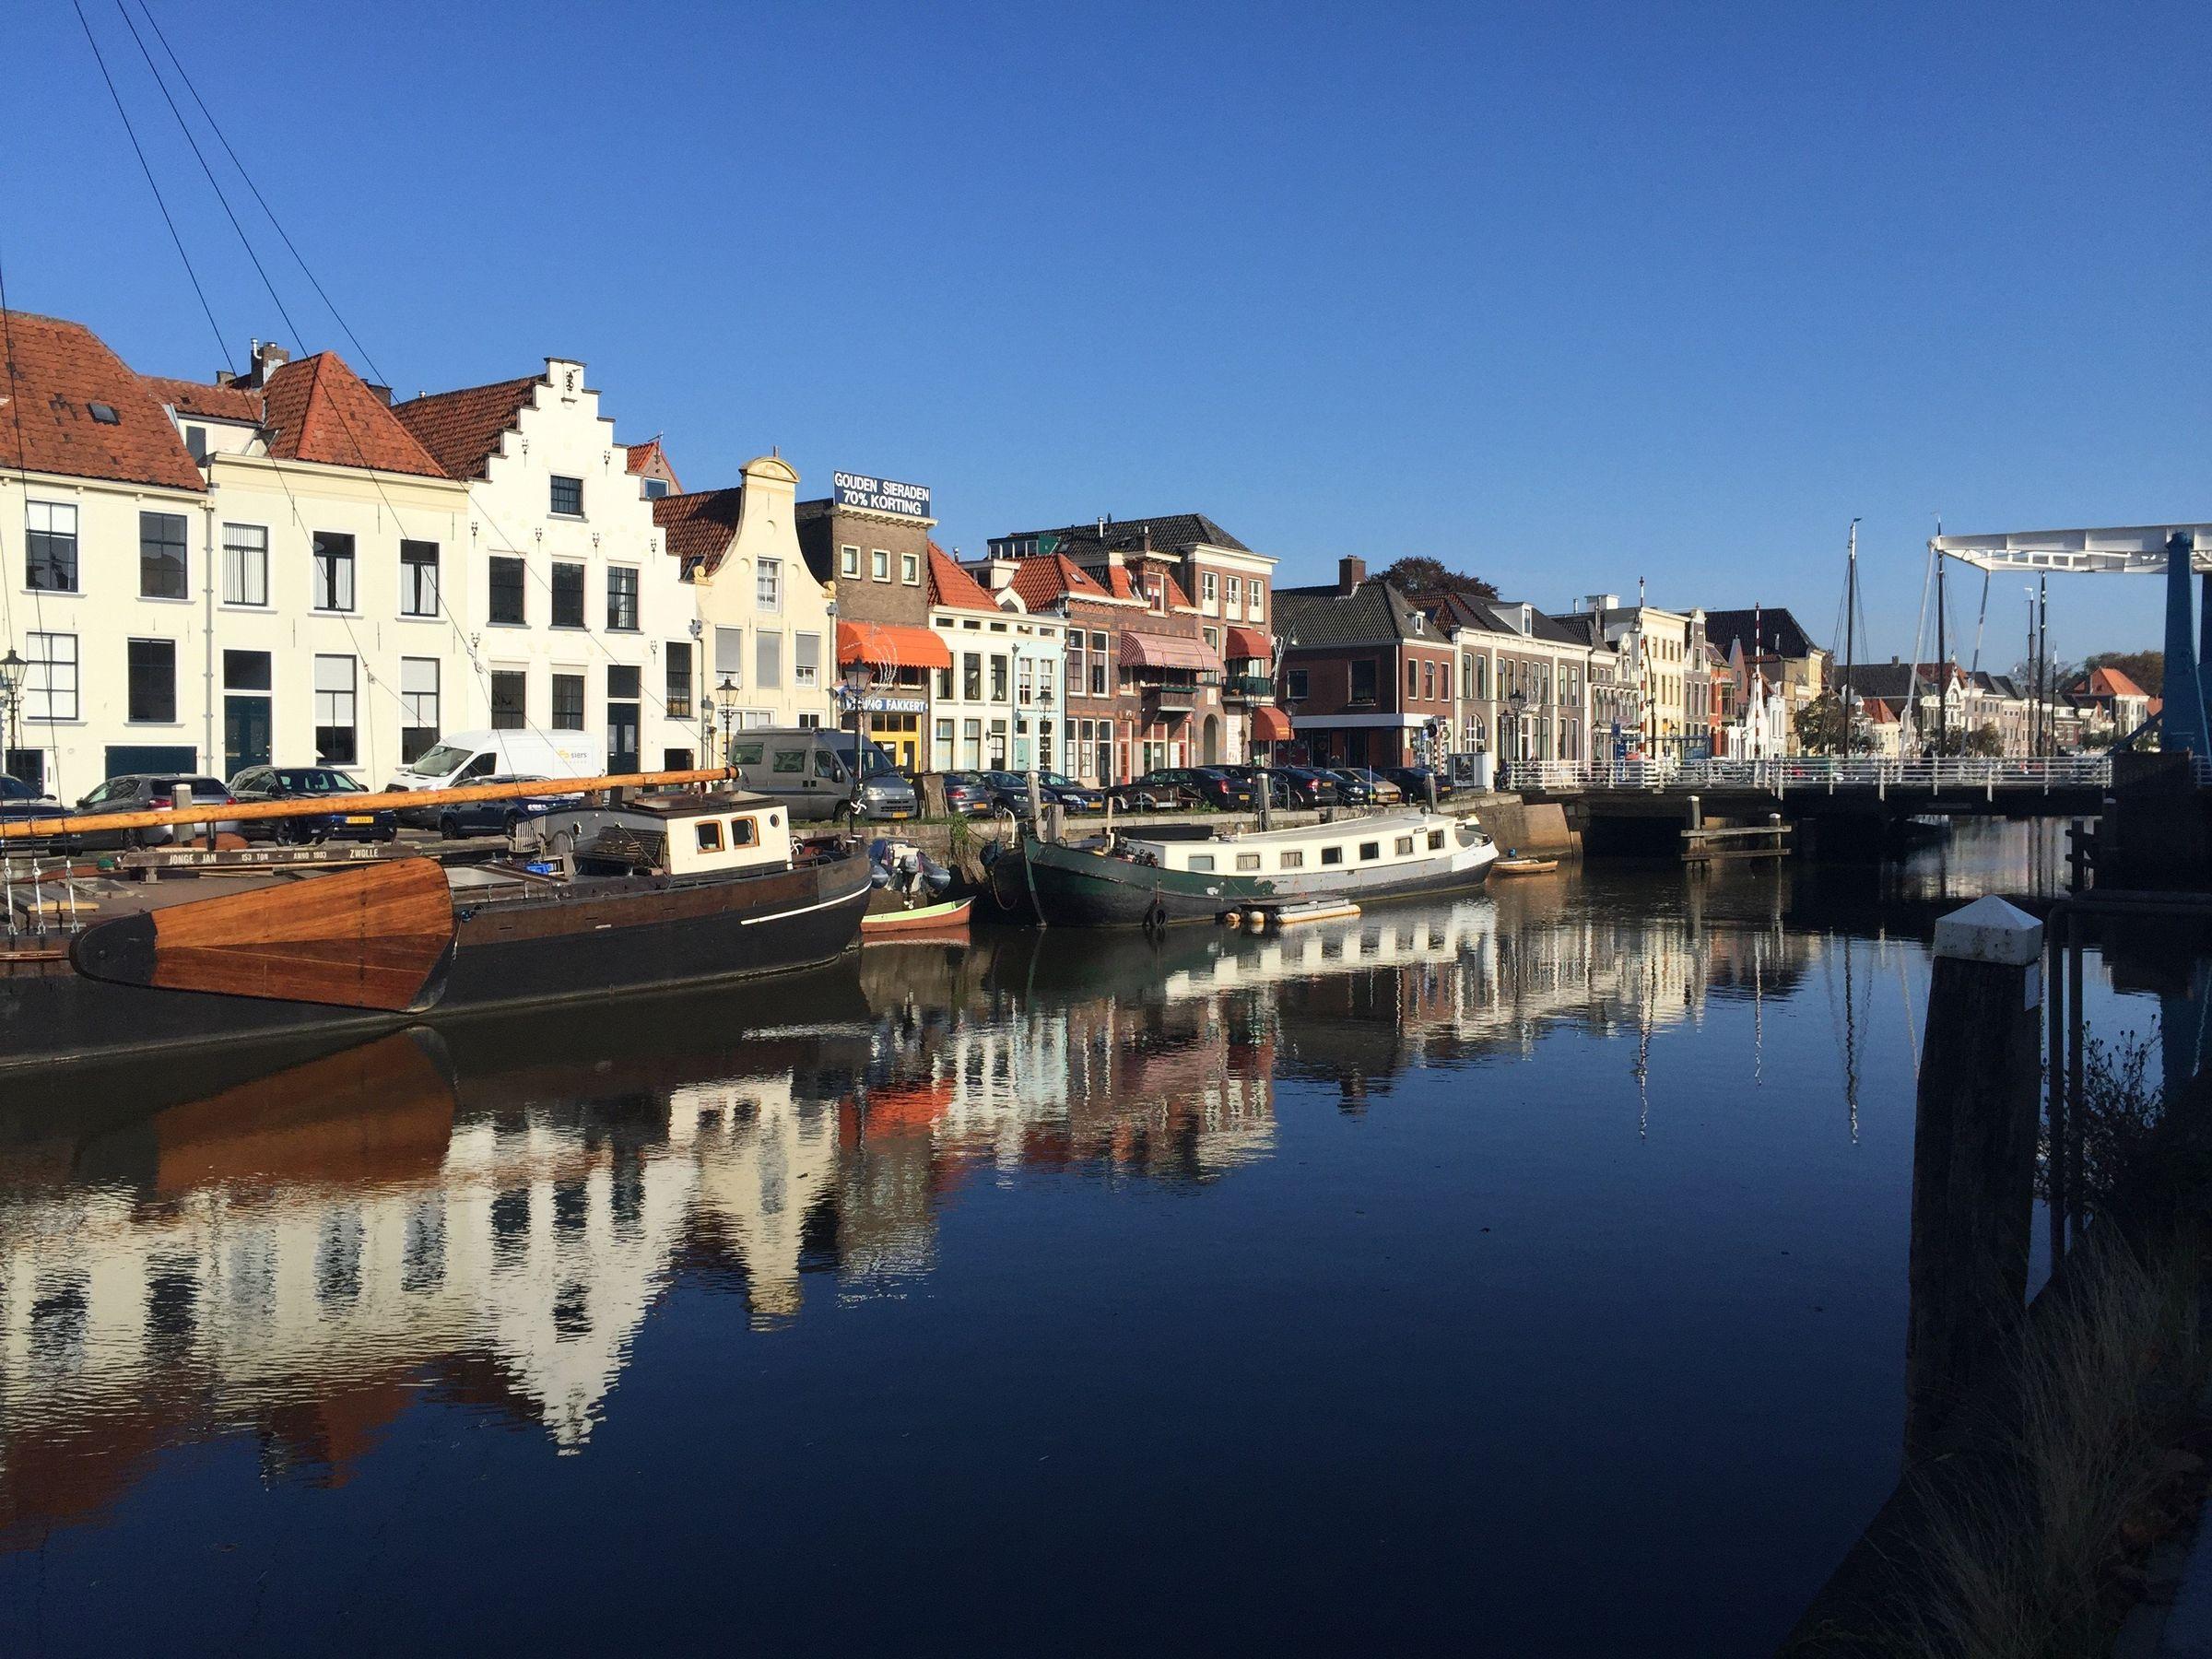 Waterstraat, Zwolle